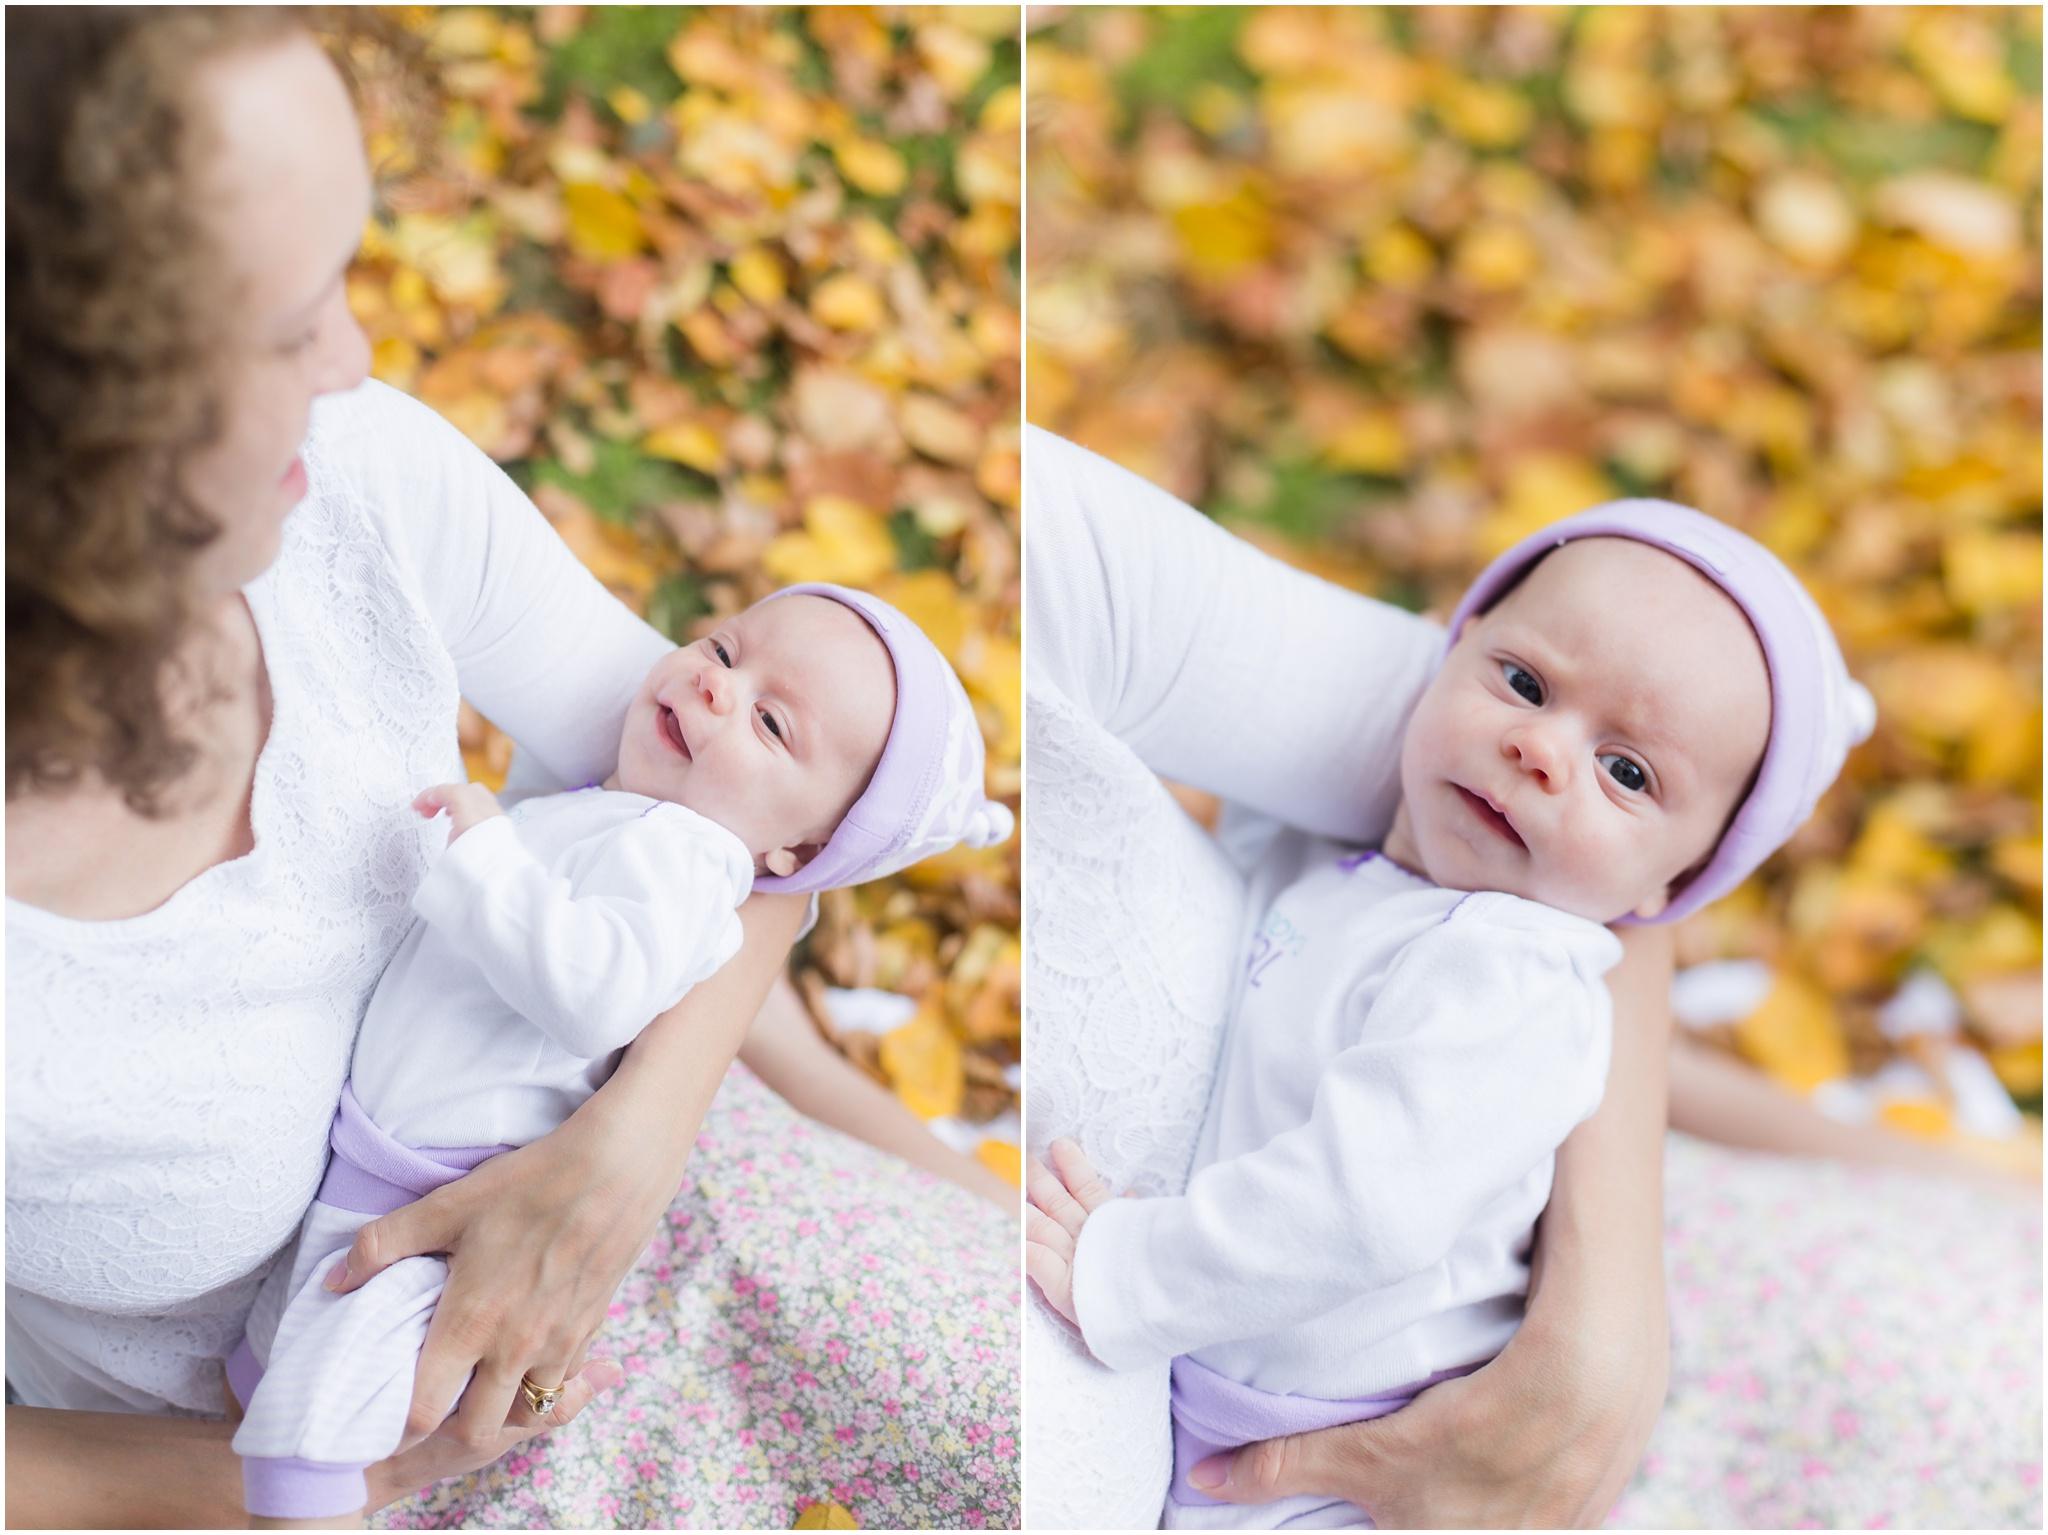 Mount Olive Family Photographer